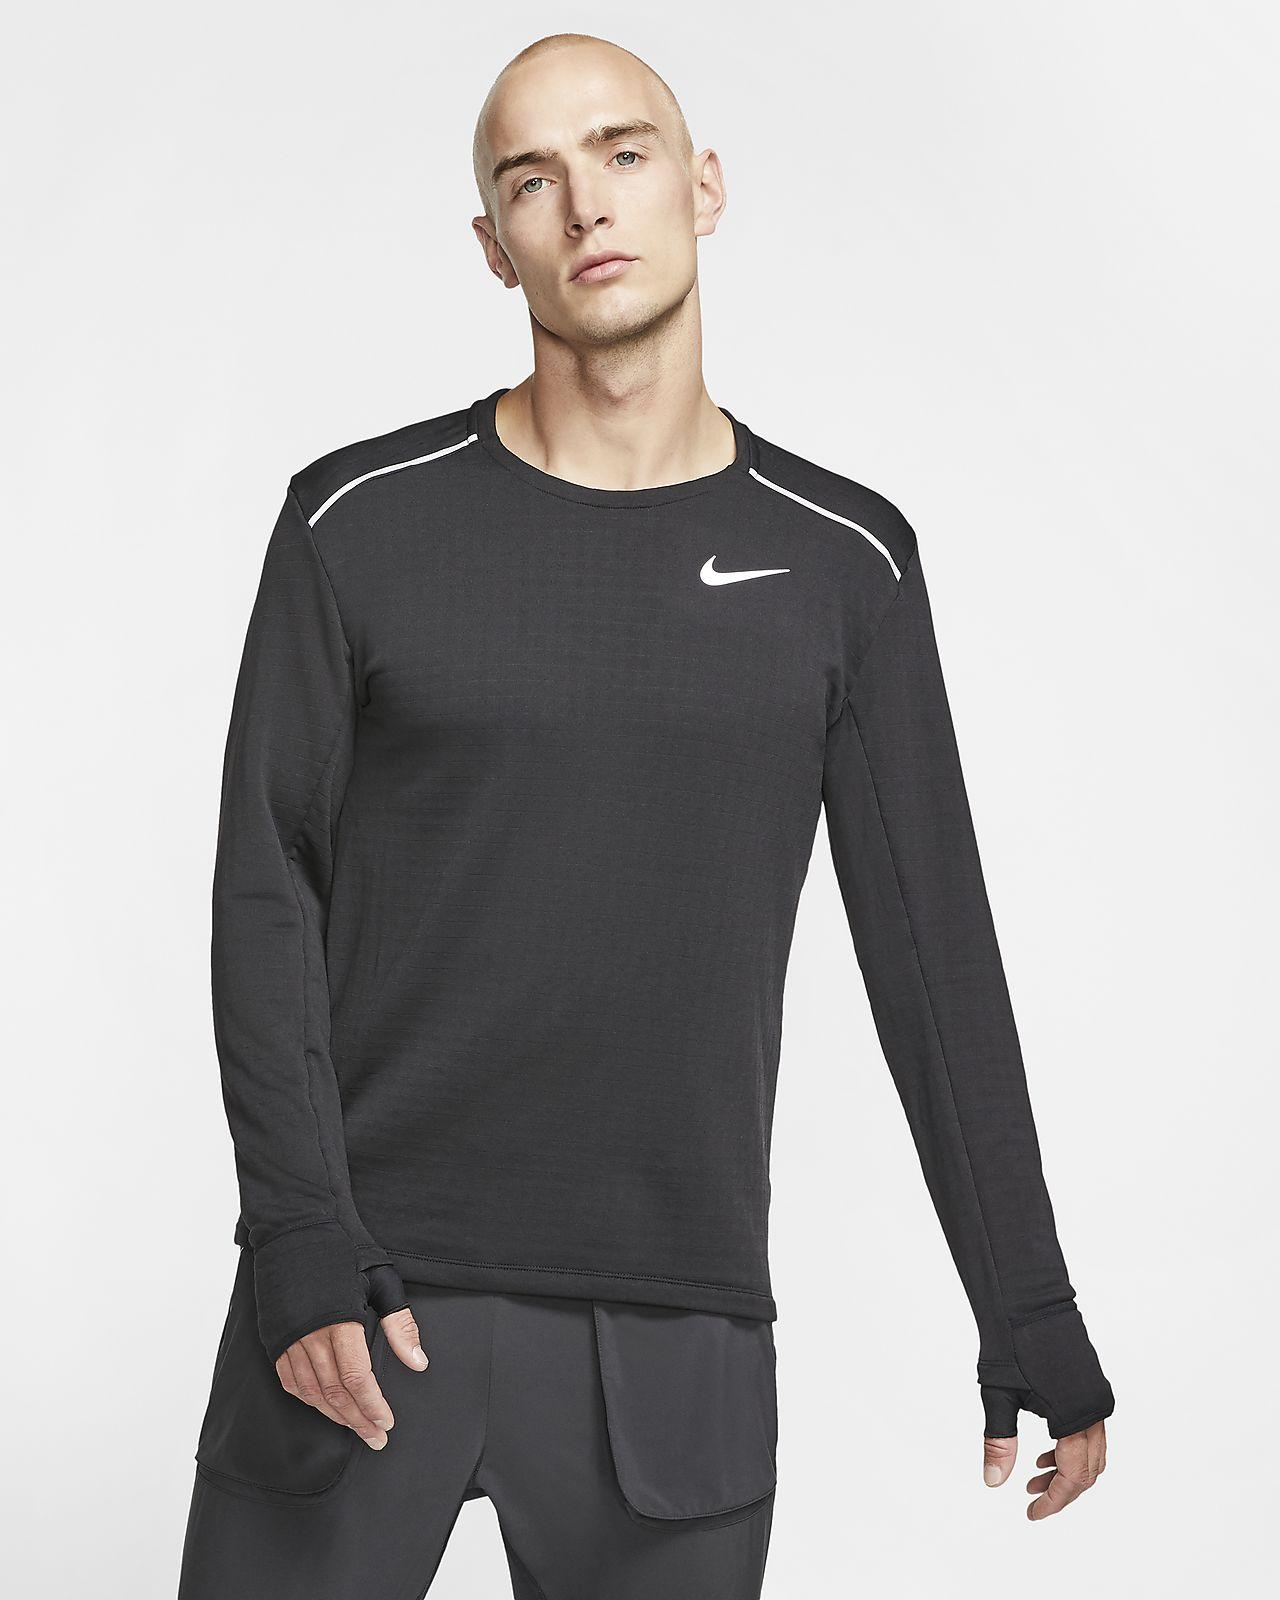 Nike Therma Sphere 3.0 hosszú ujjú férfi futófelső